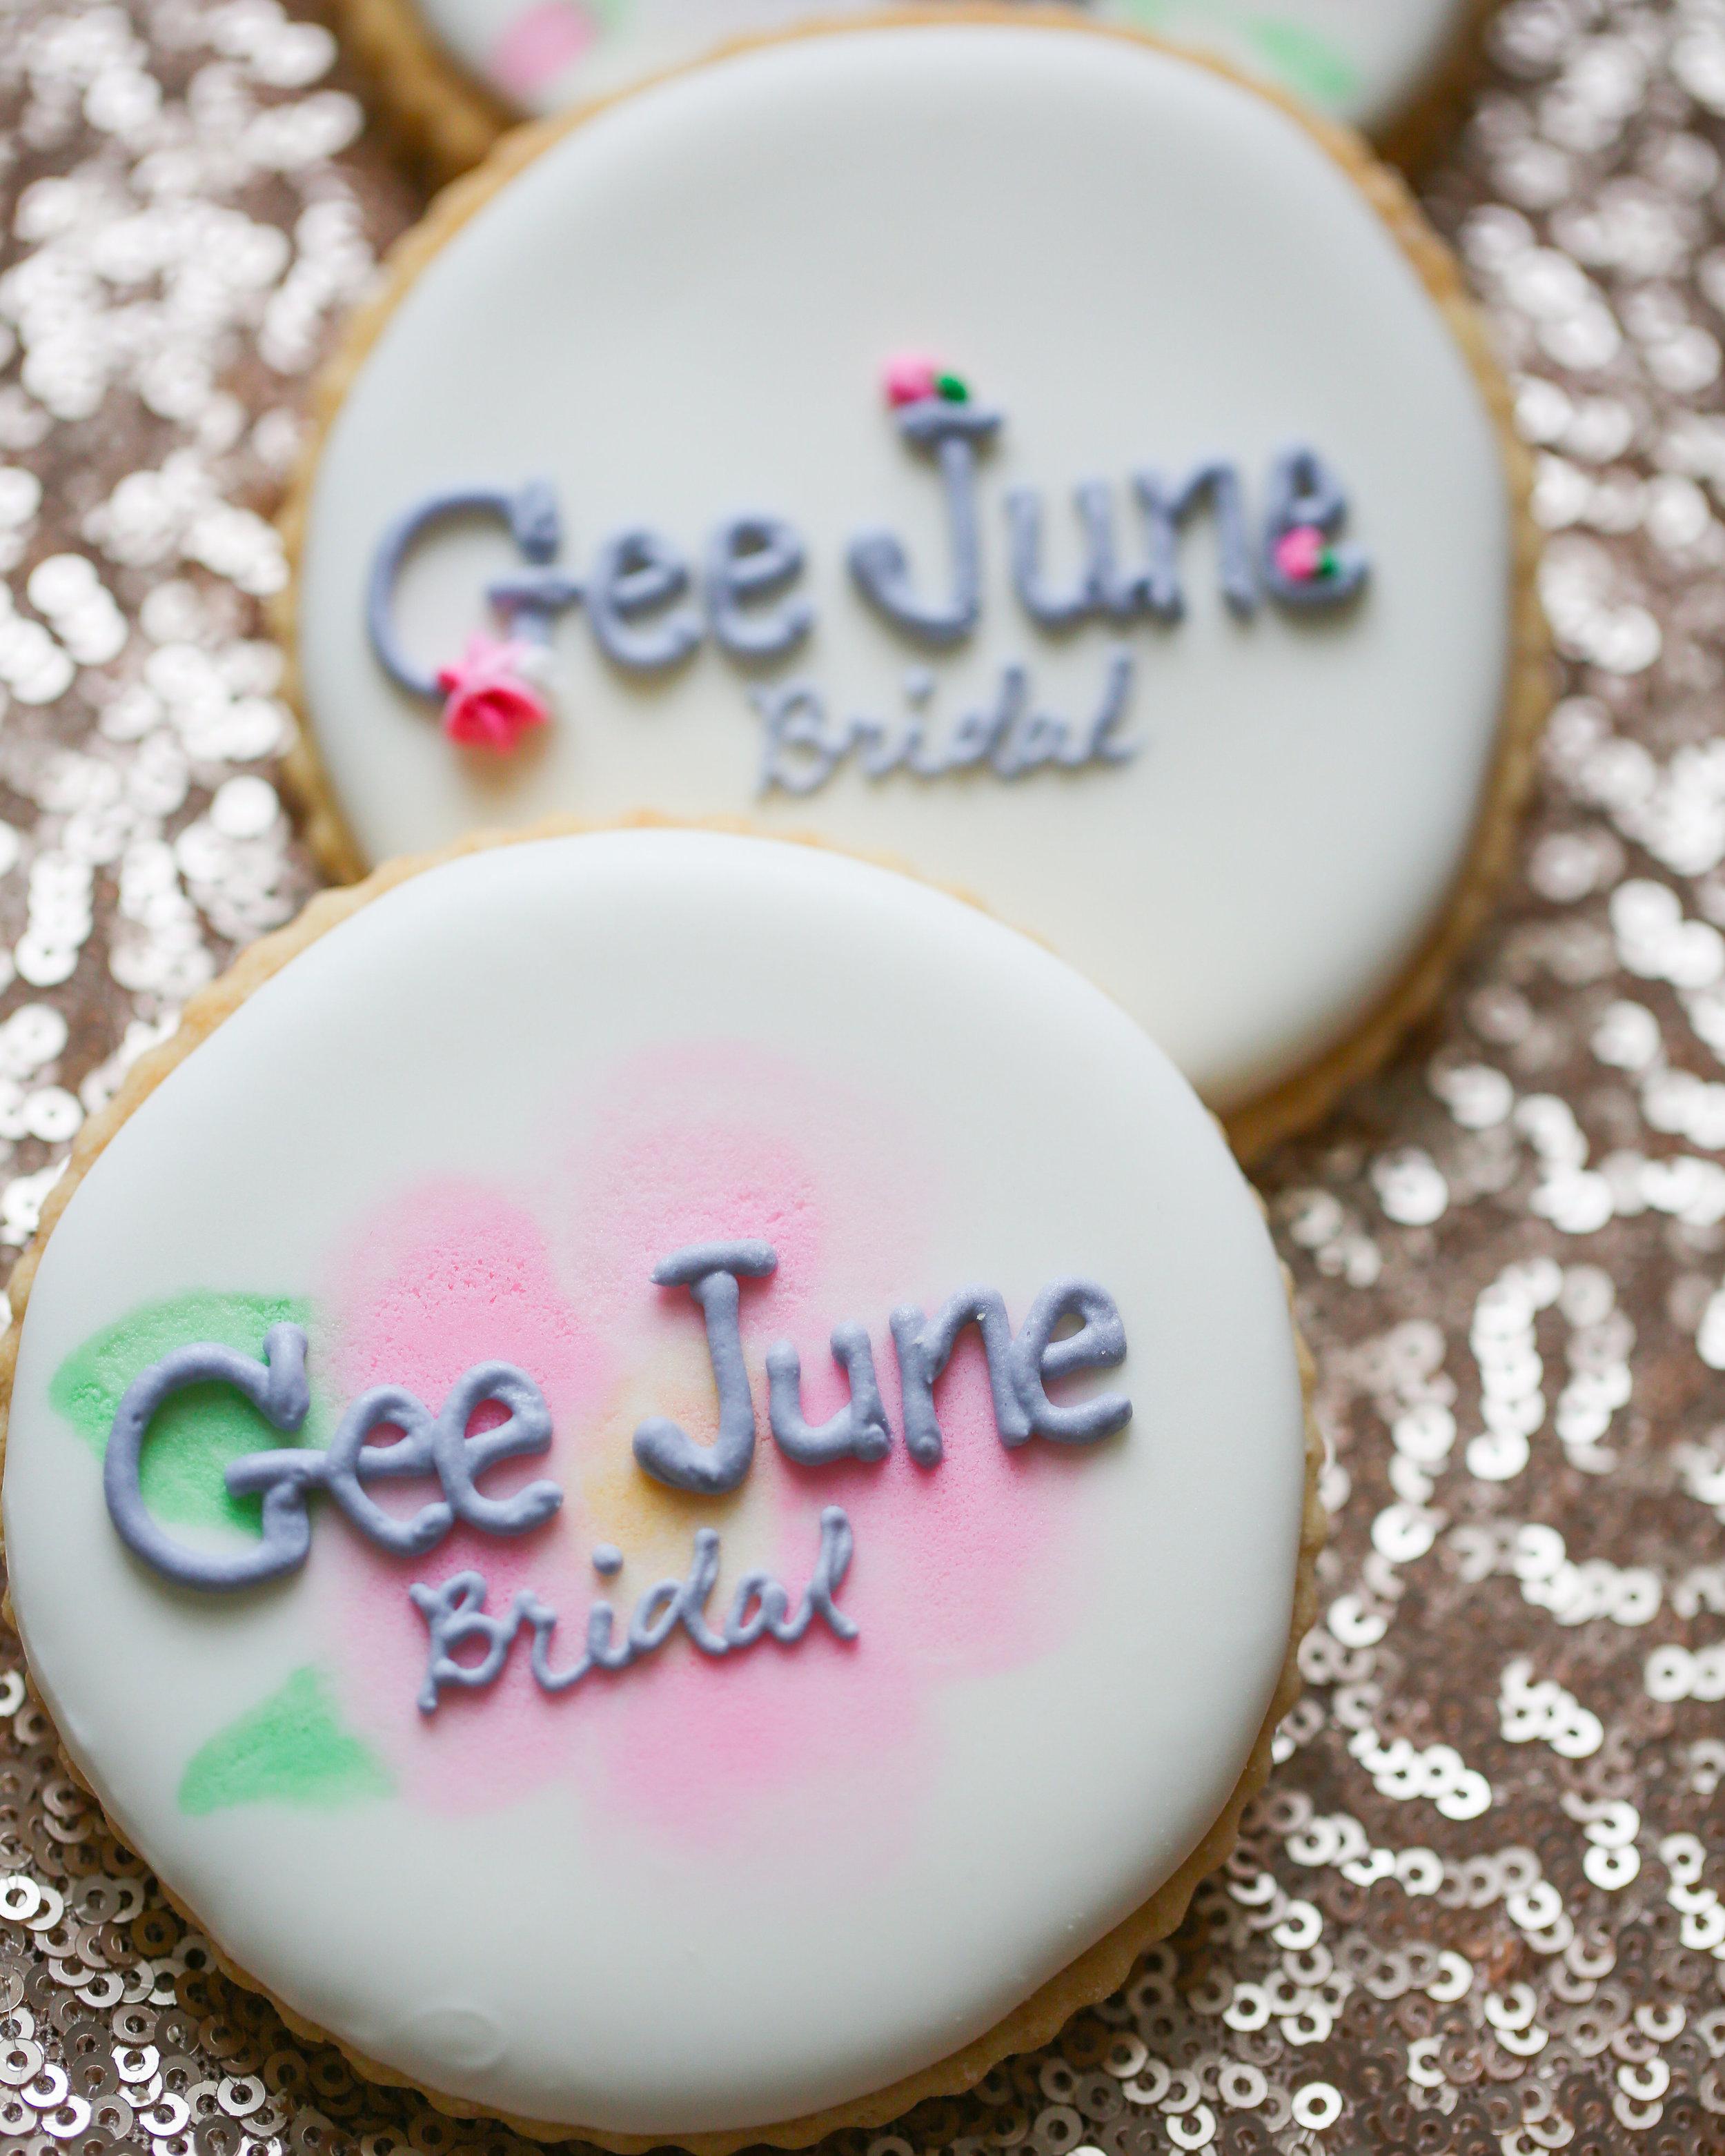 Gee June Bridal Bride Show-Final-0075.jpg